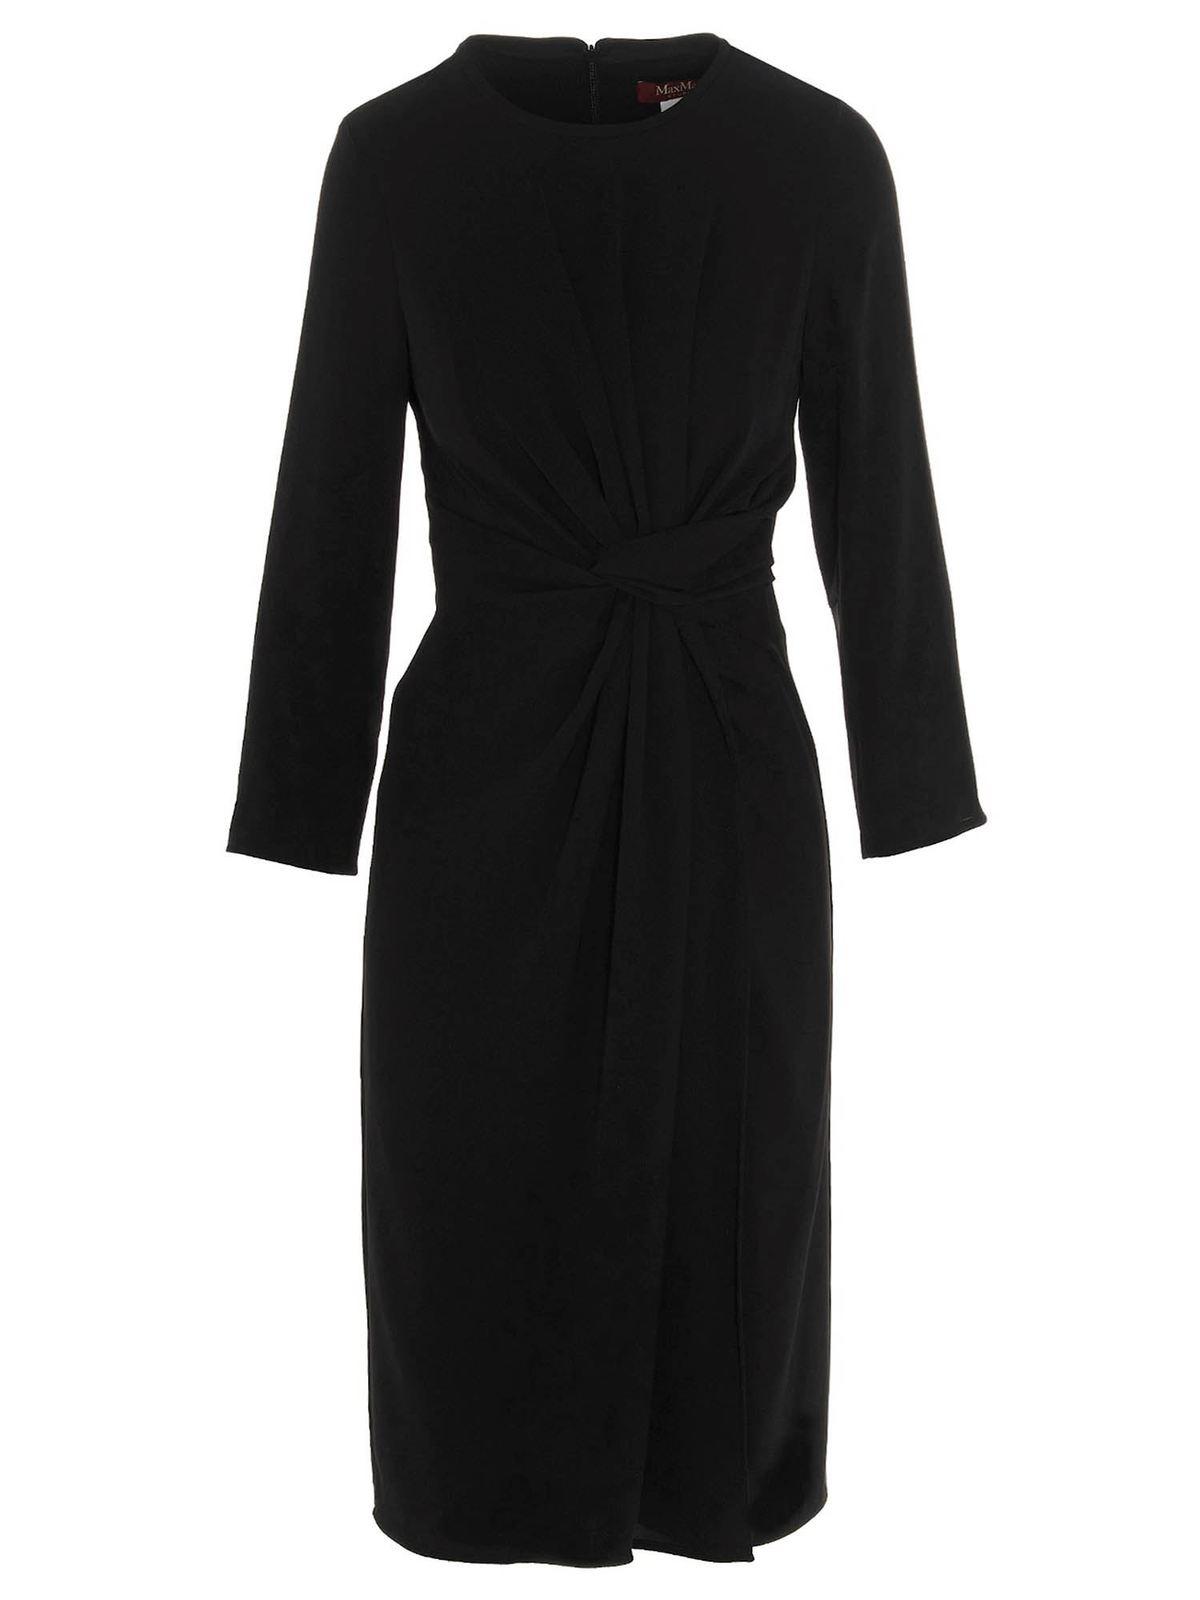 Max Mara NUBLE DRESS IN BLACK